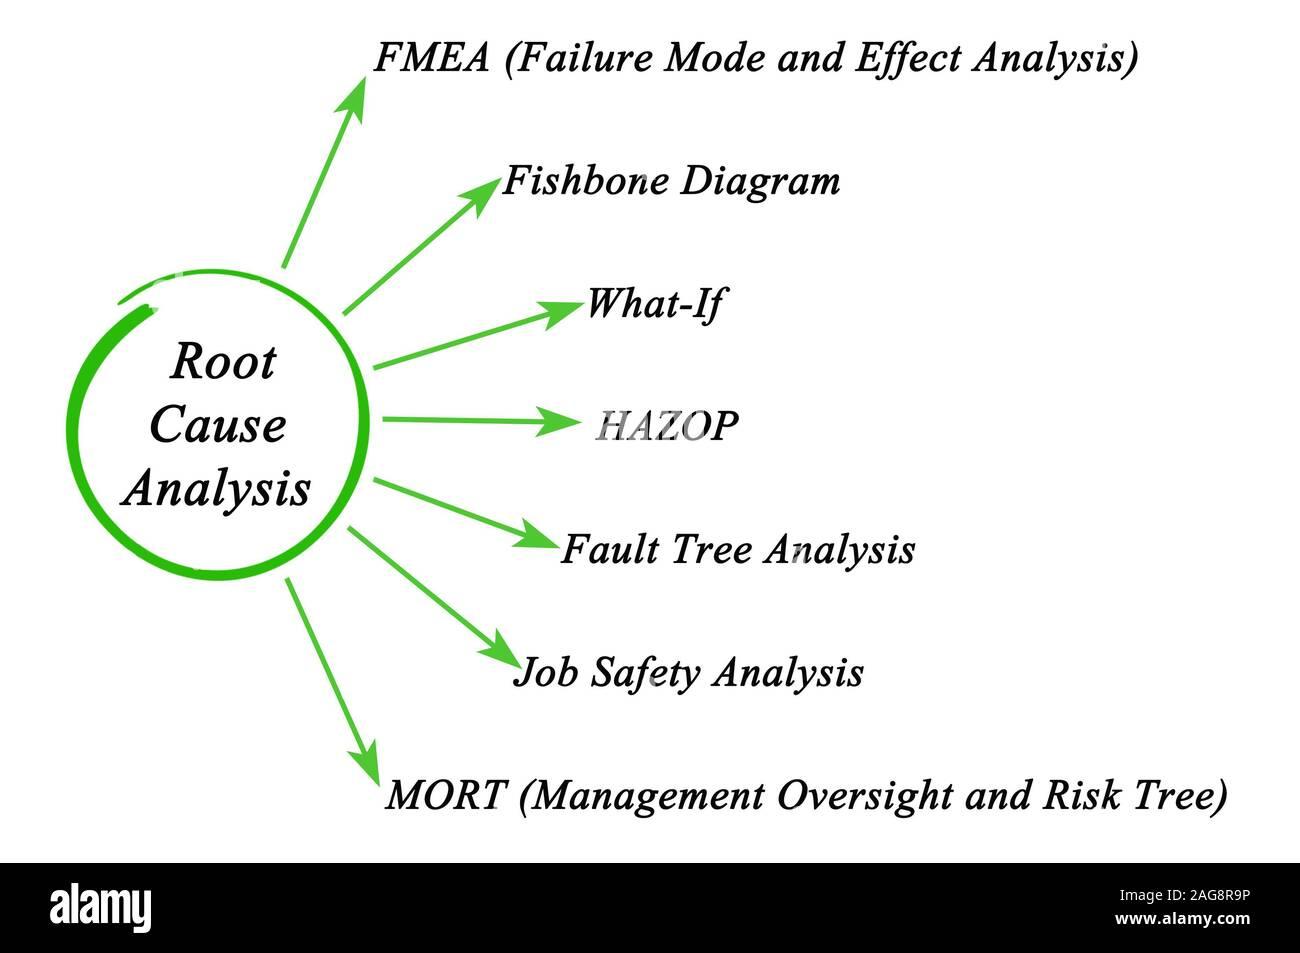 Root Cause Analysis Stock Photo